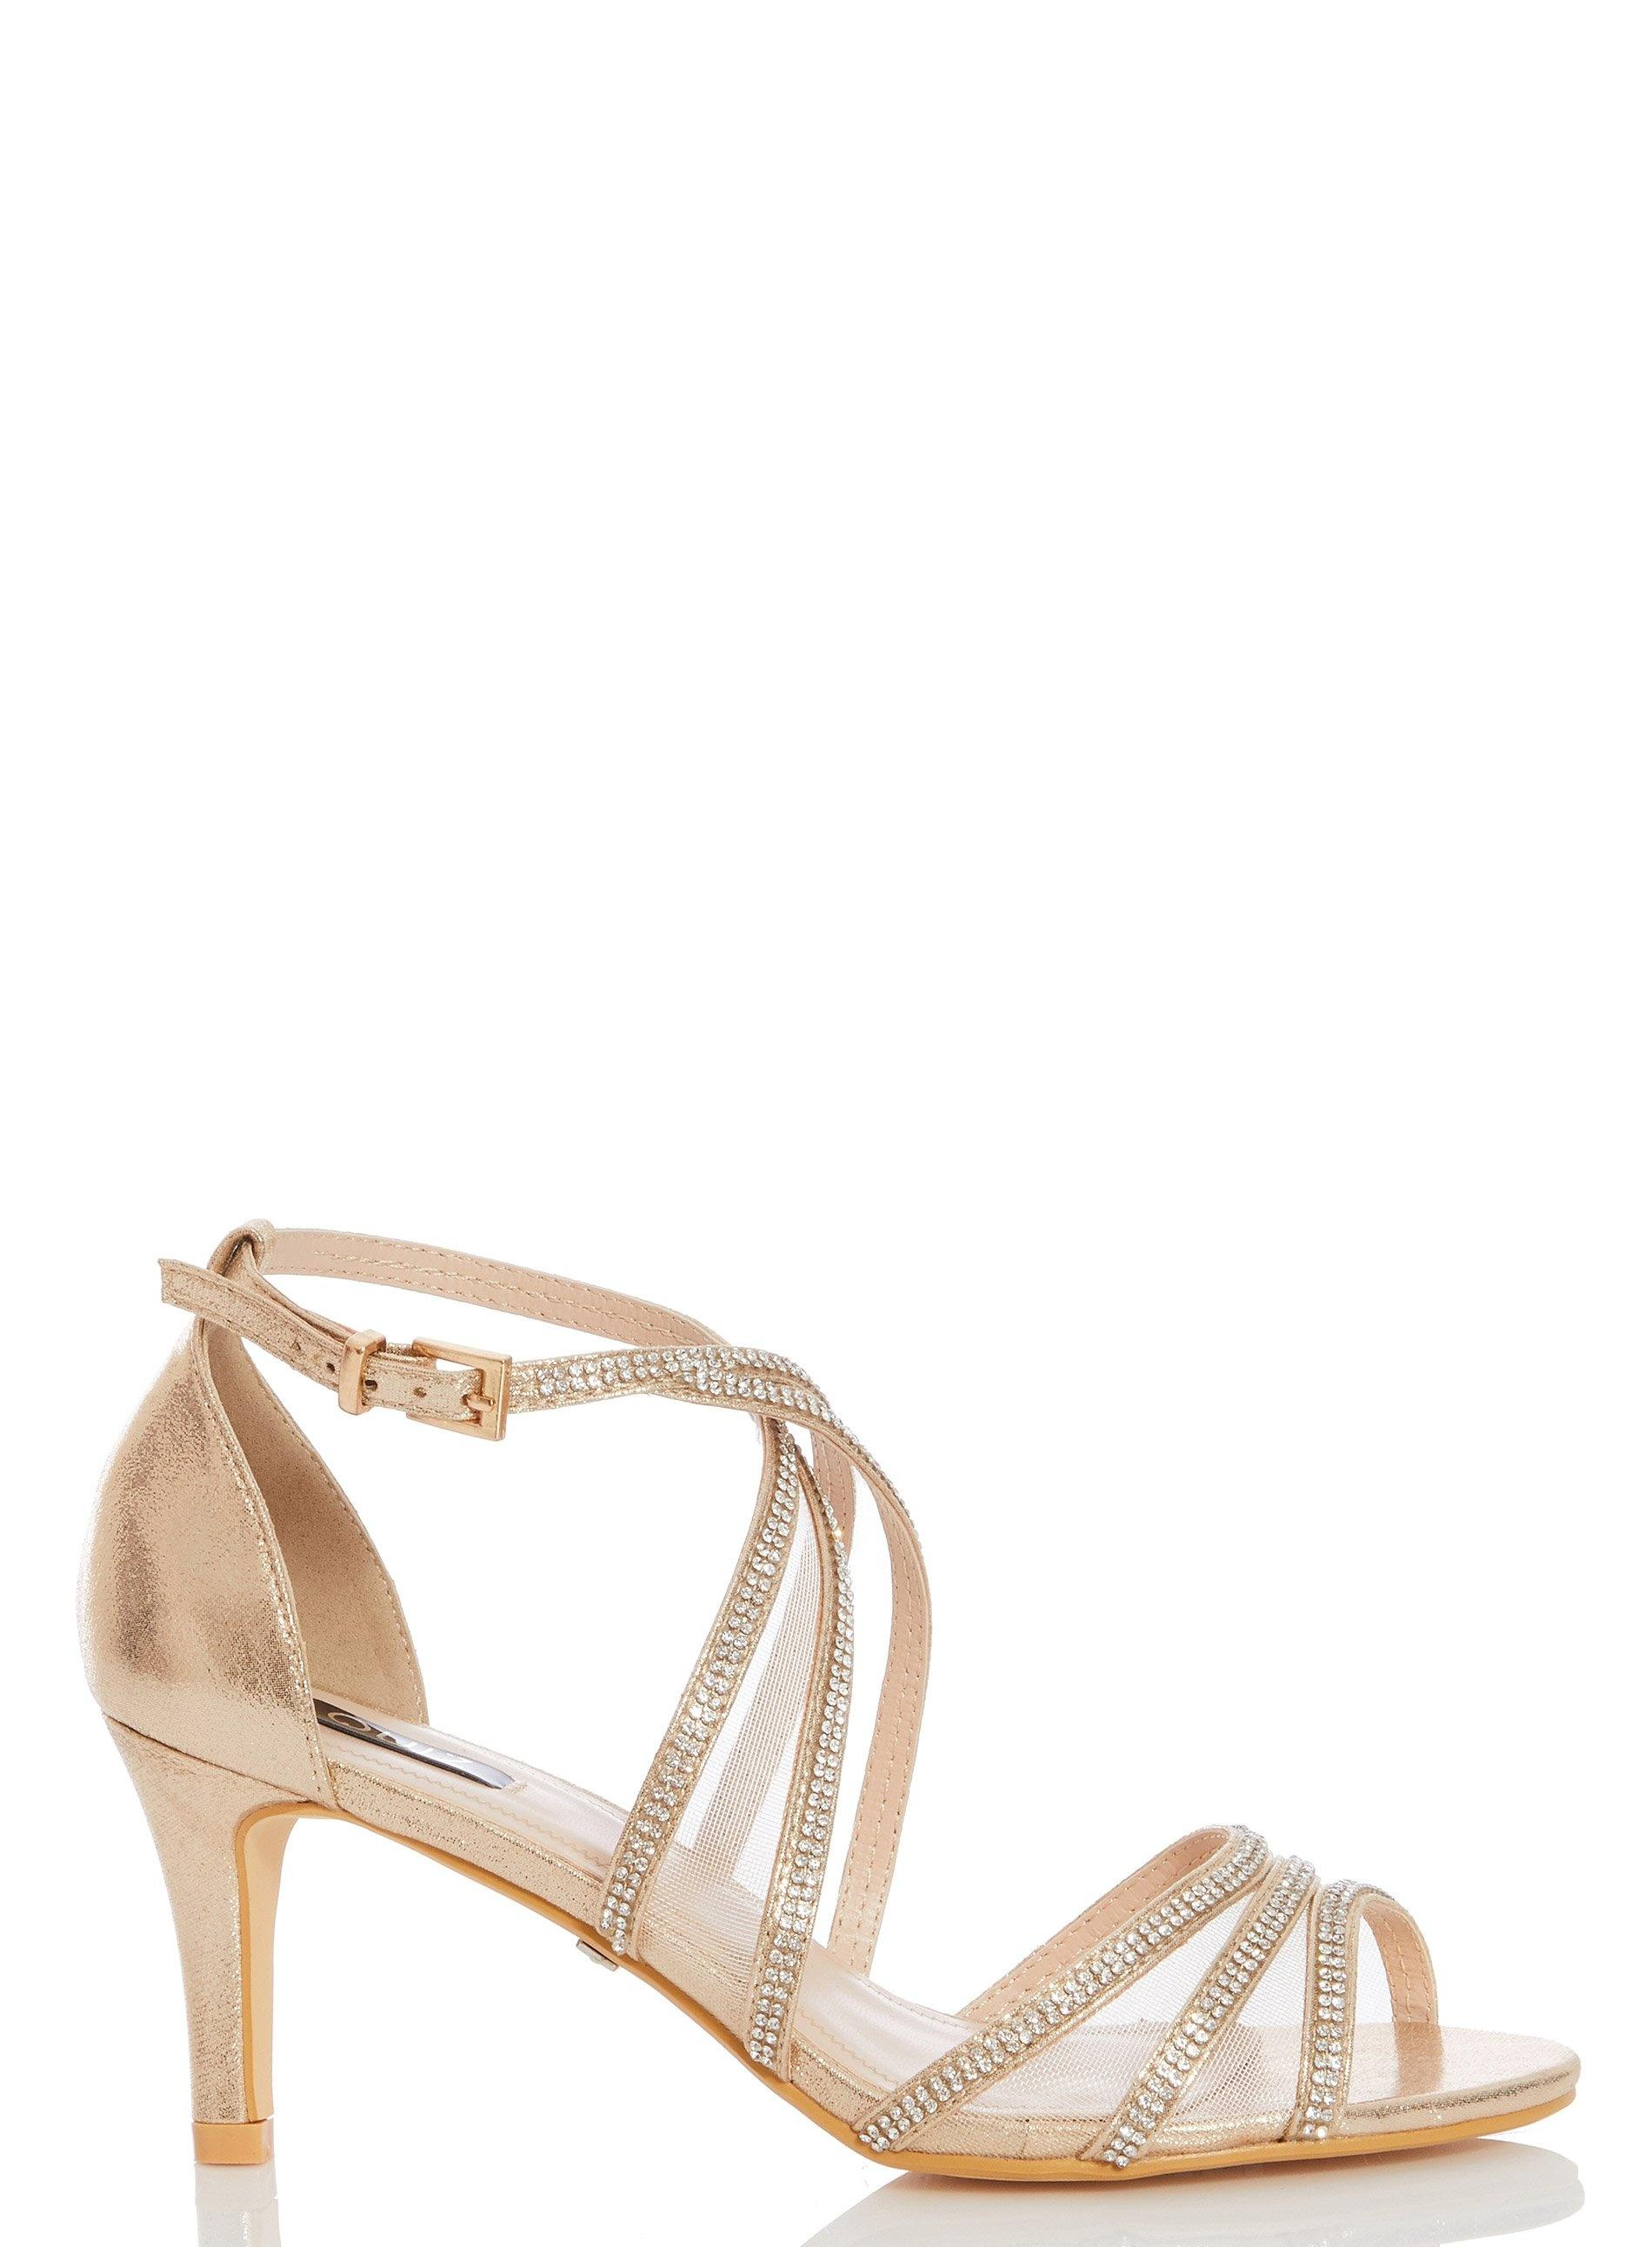 50888e2898d Dorothy Perkins Quiz Gold Diamante Mid Heel Sandals in Metallic - Lyst